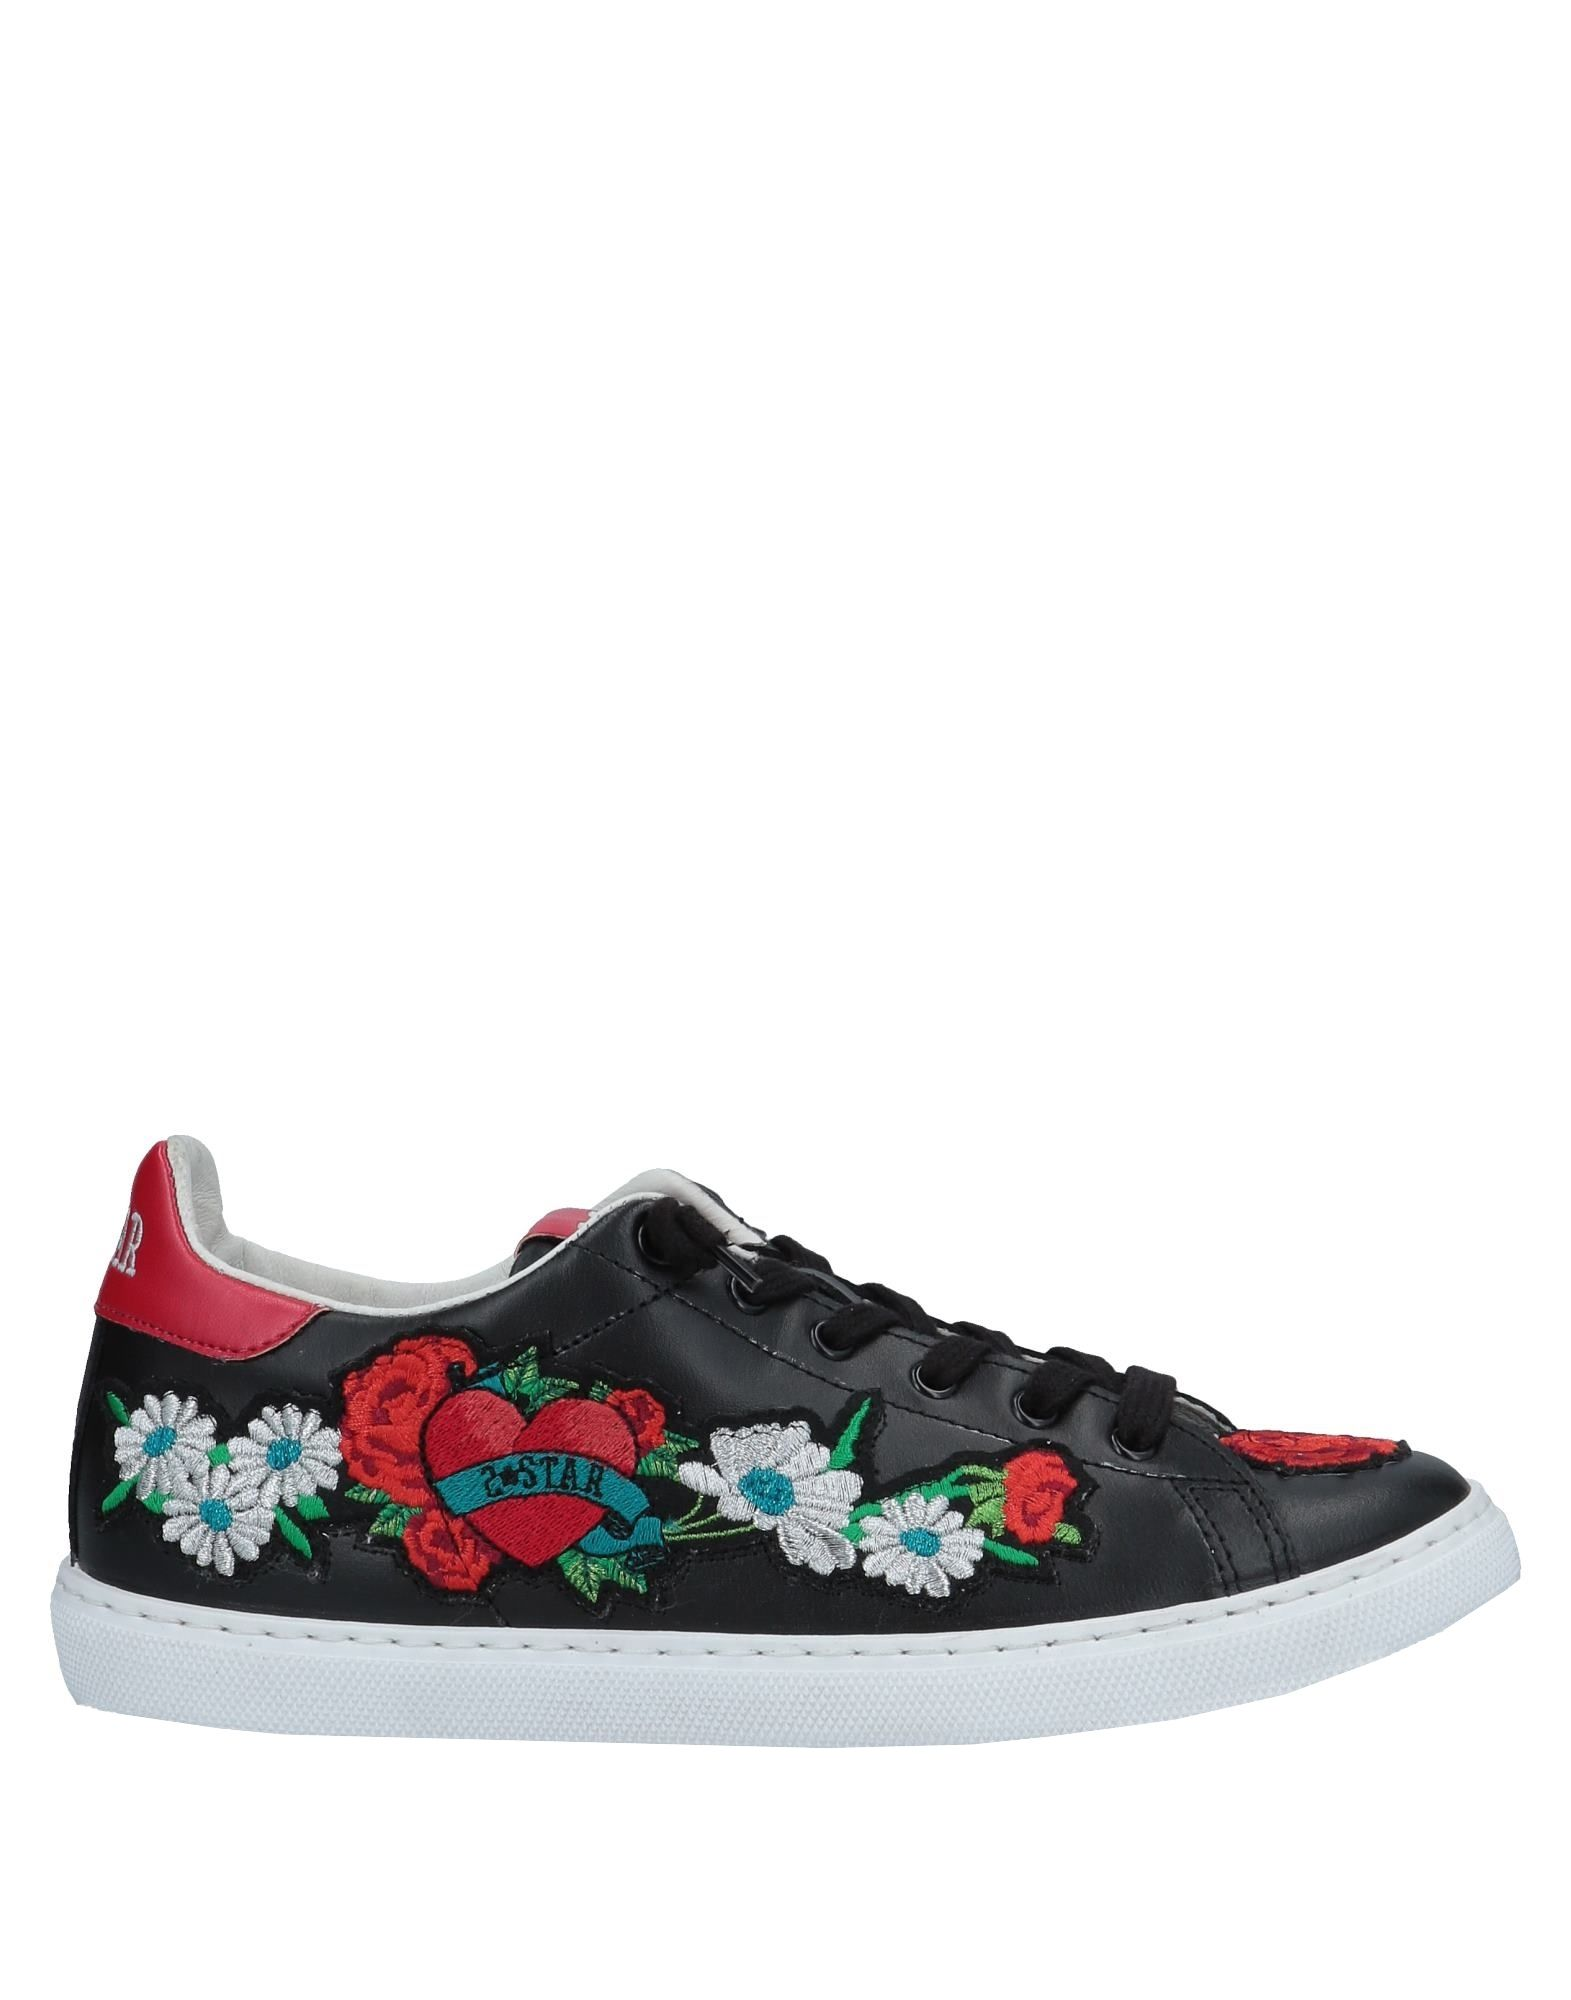 2Star Sneakers - Australia Women 2Star Sneakers online on  Australia - - 11554052UH f10f29